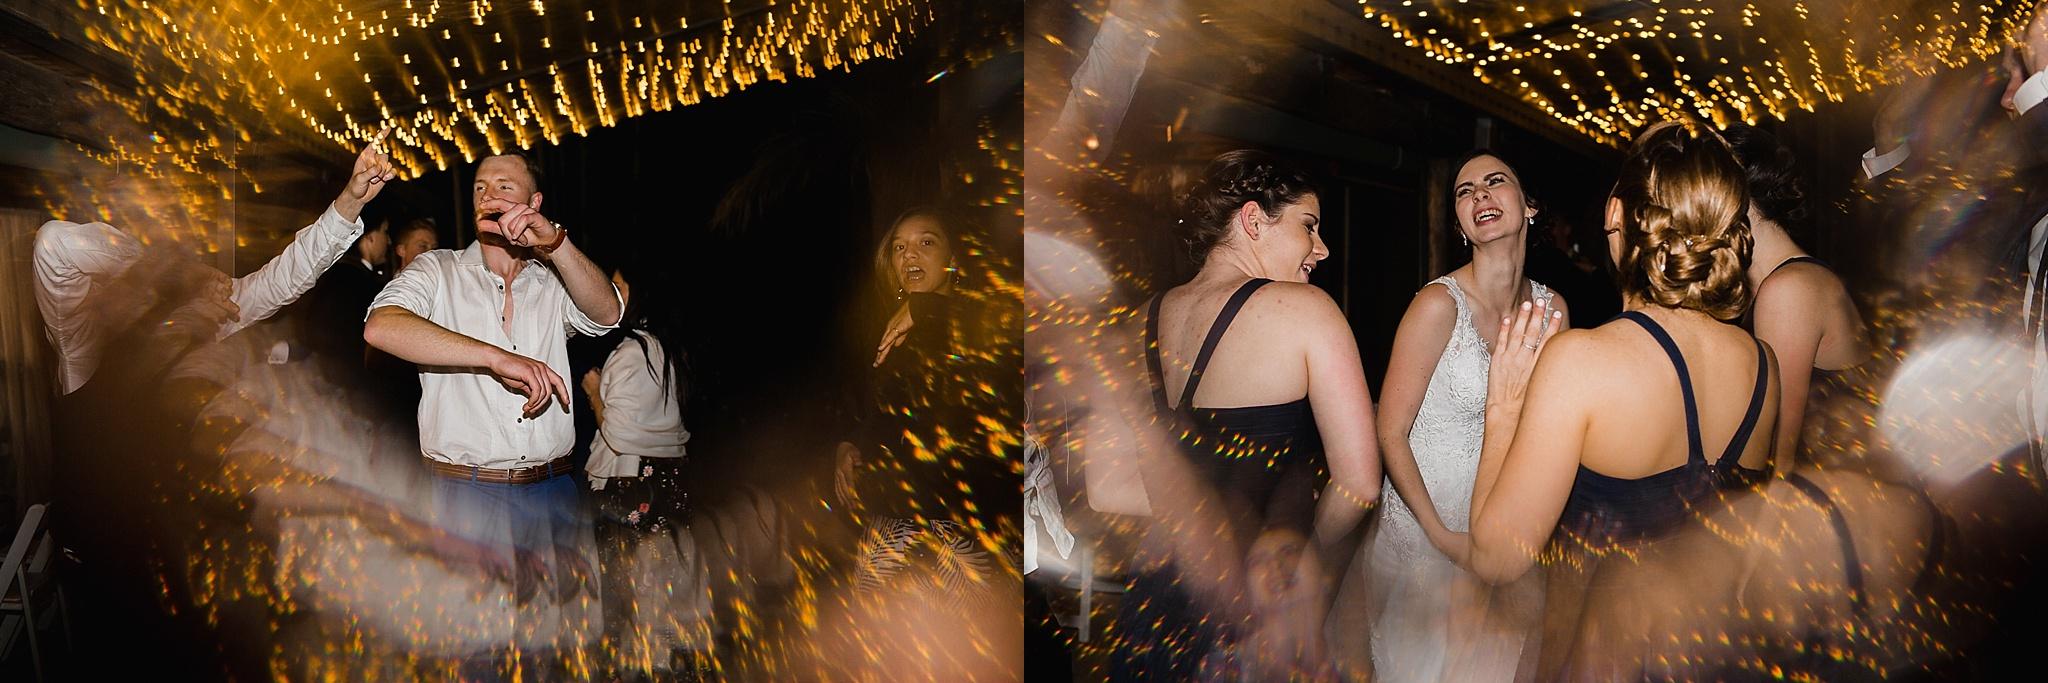 Boomerany_Farm_Wedding_dancing_0002.jpg